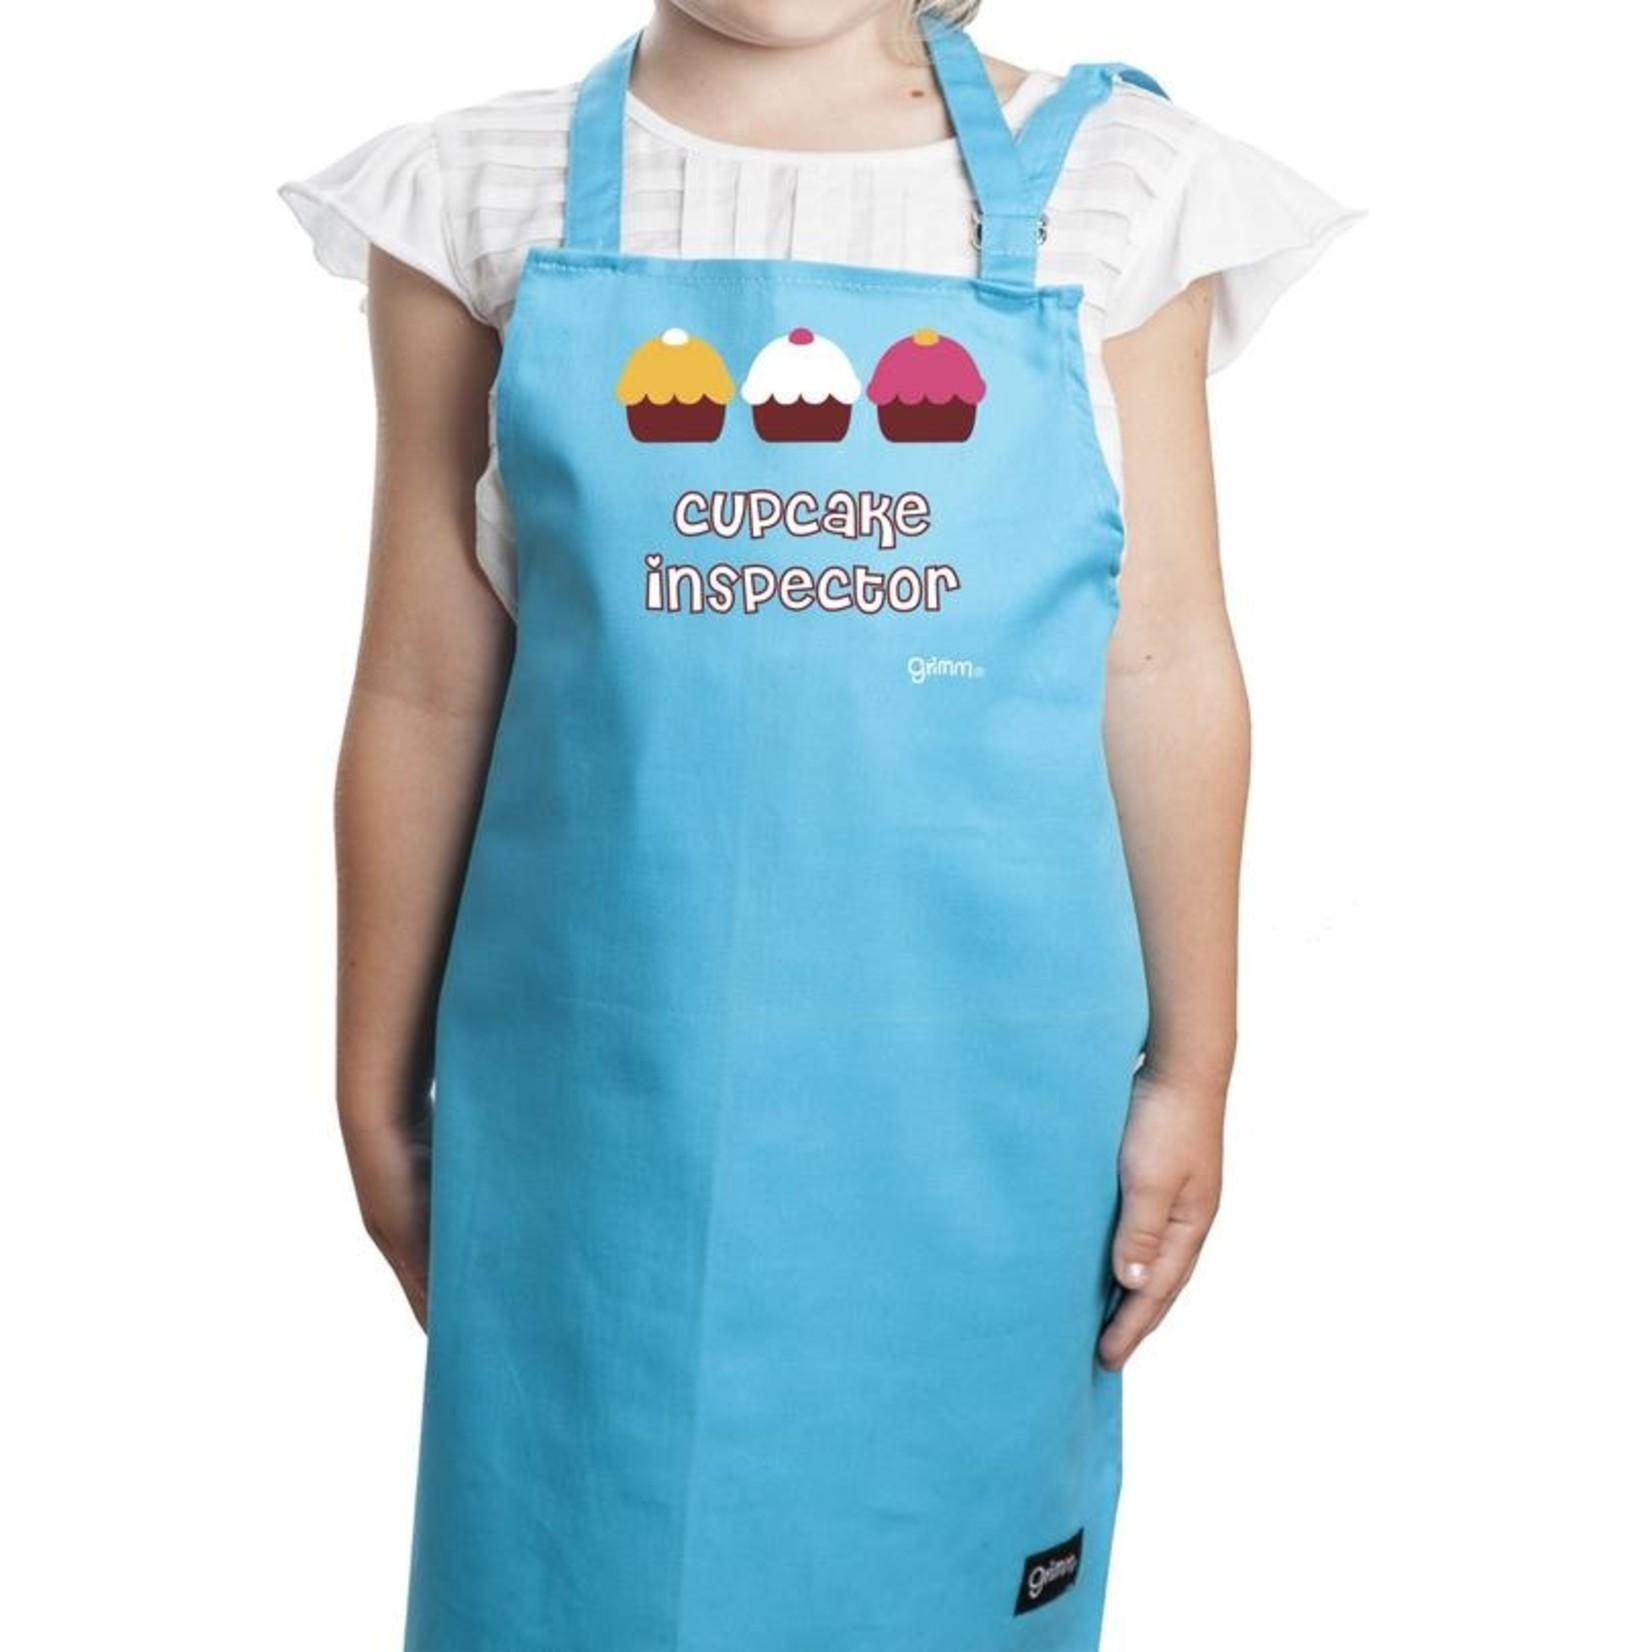 Children's Apron - Cupcake Inspector